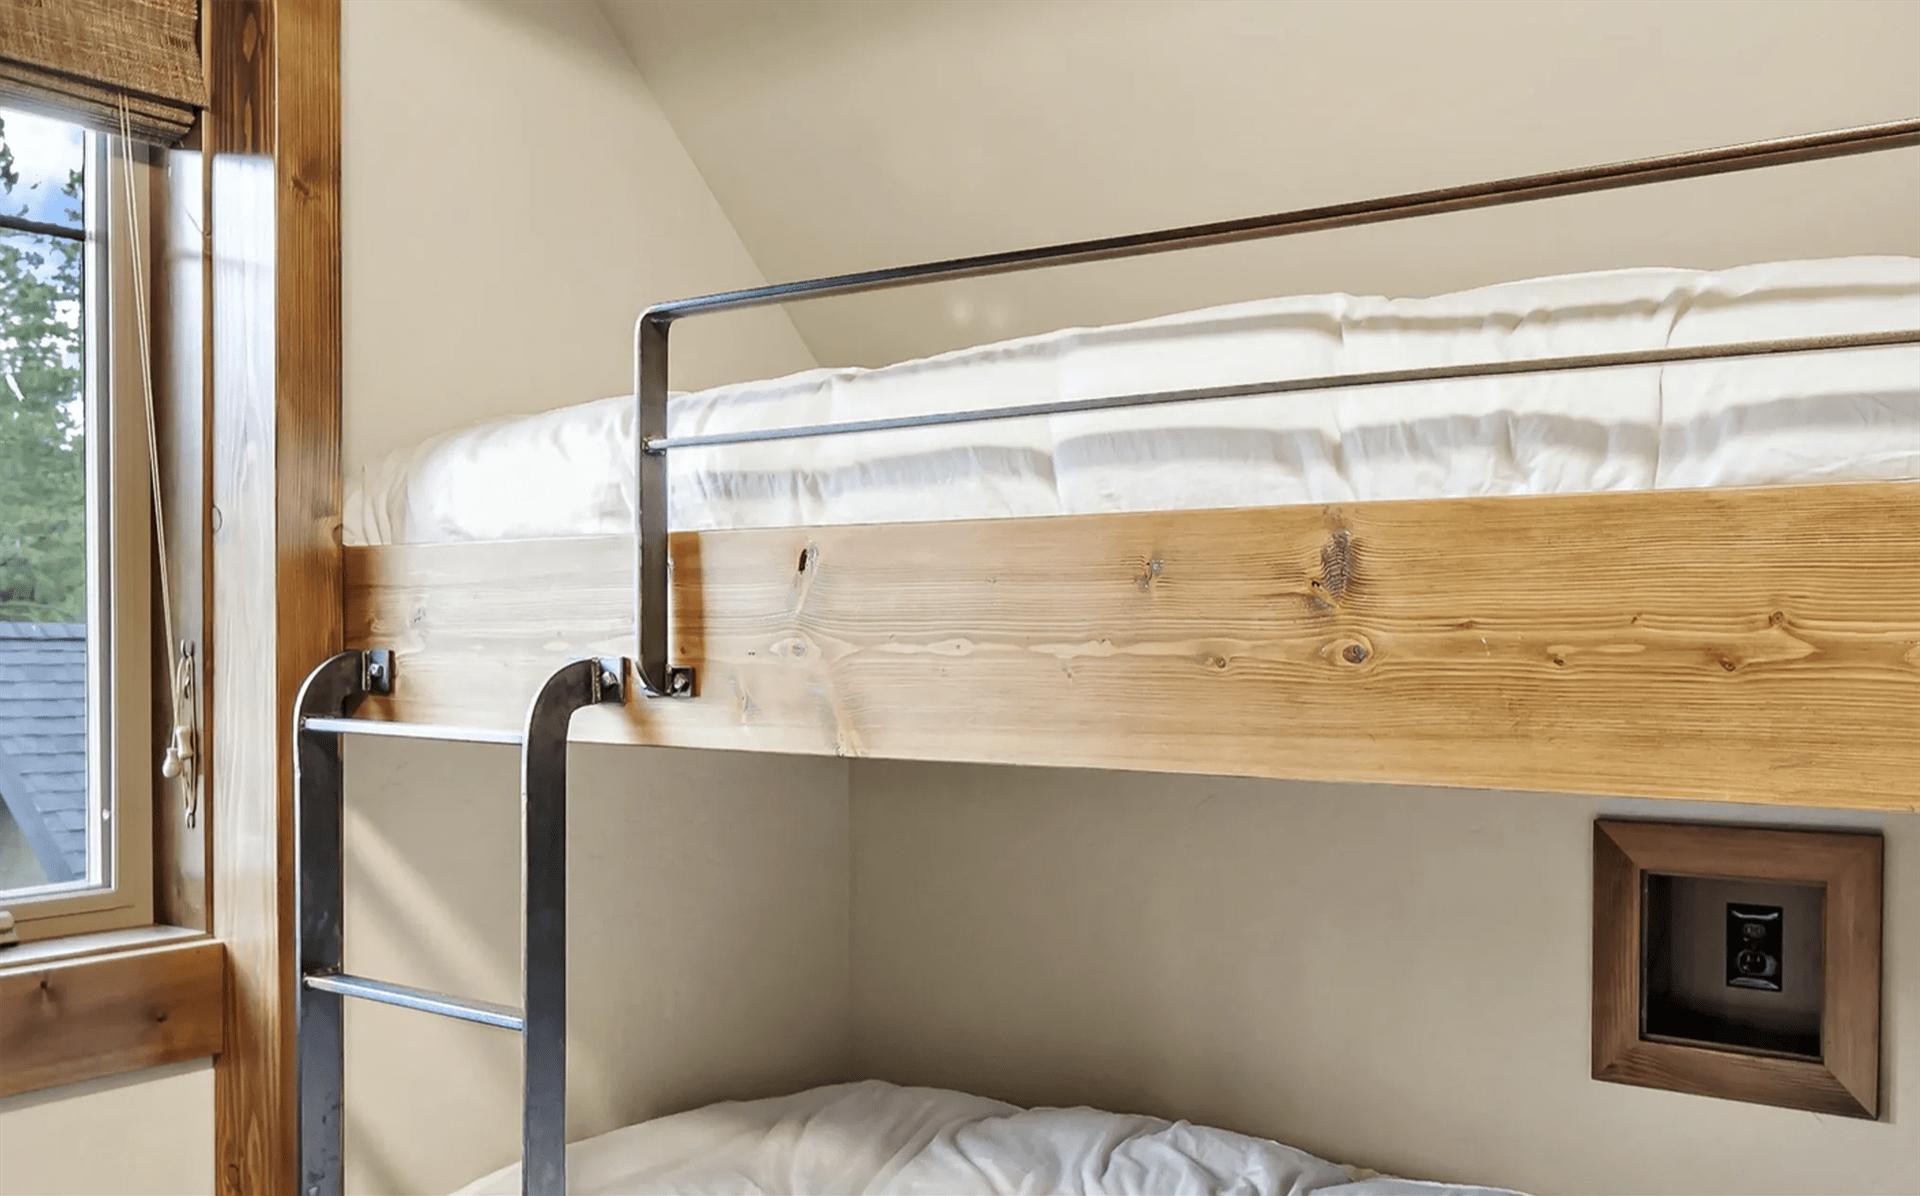 Wood from HomePort Interiors in Bellingham, WA